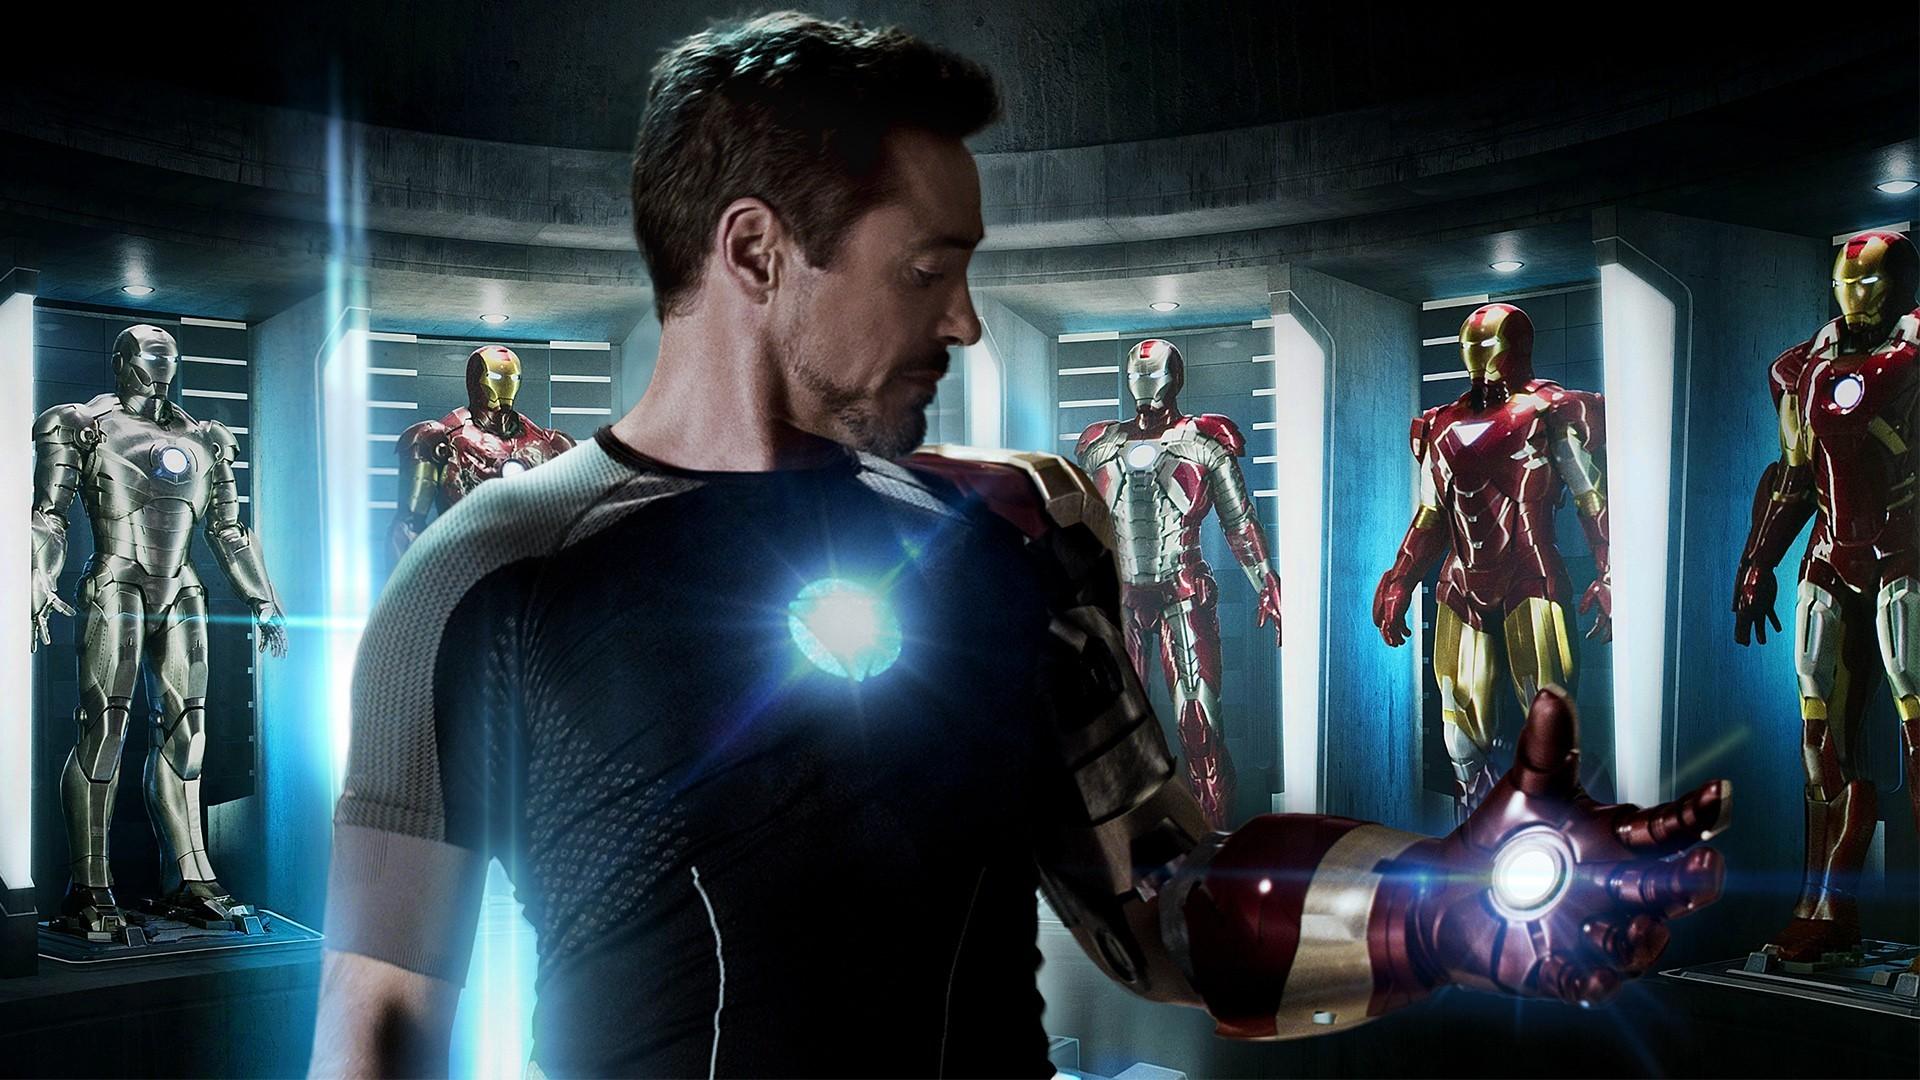 Tony Stark 4k Wallpaper: Wallpaper : Glowing, Movies, Superhero, Iron Man, The